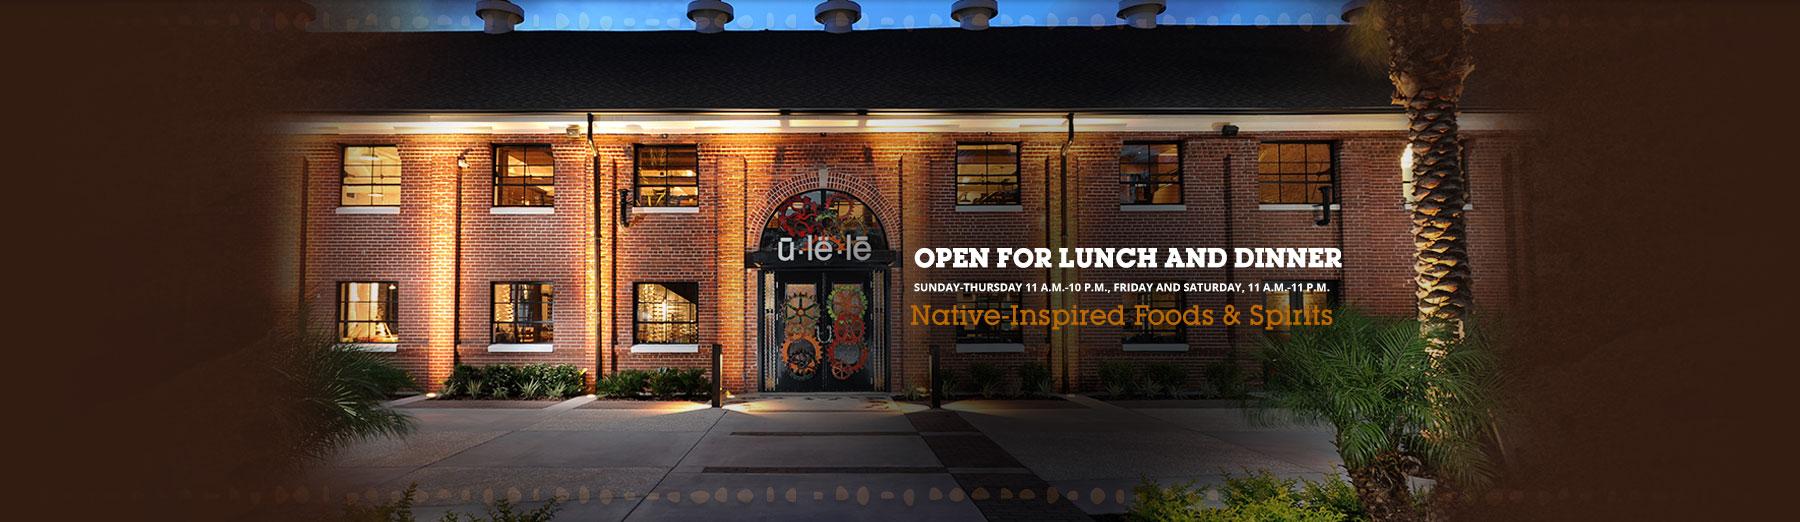 Inspiration Cuisine En U home - ulele - tampa restaurant now open on tampa's riverwalk